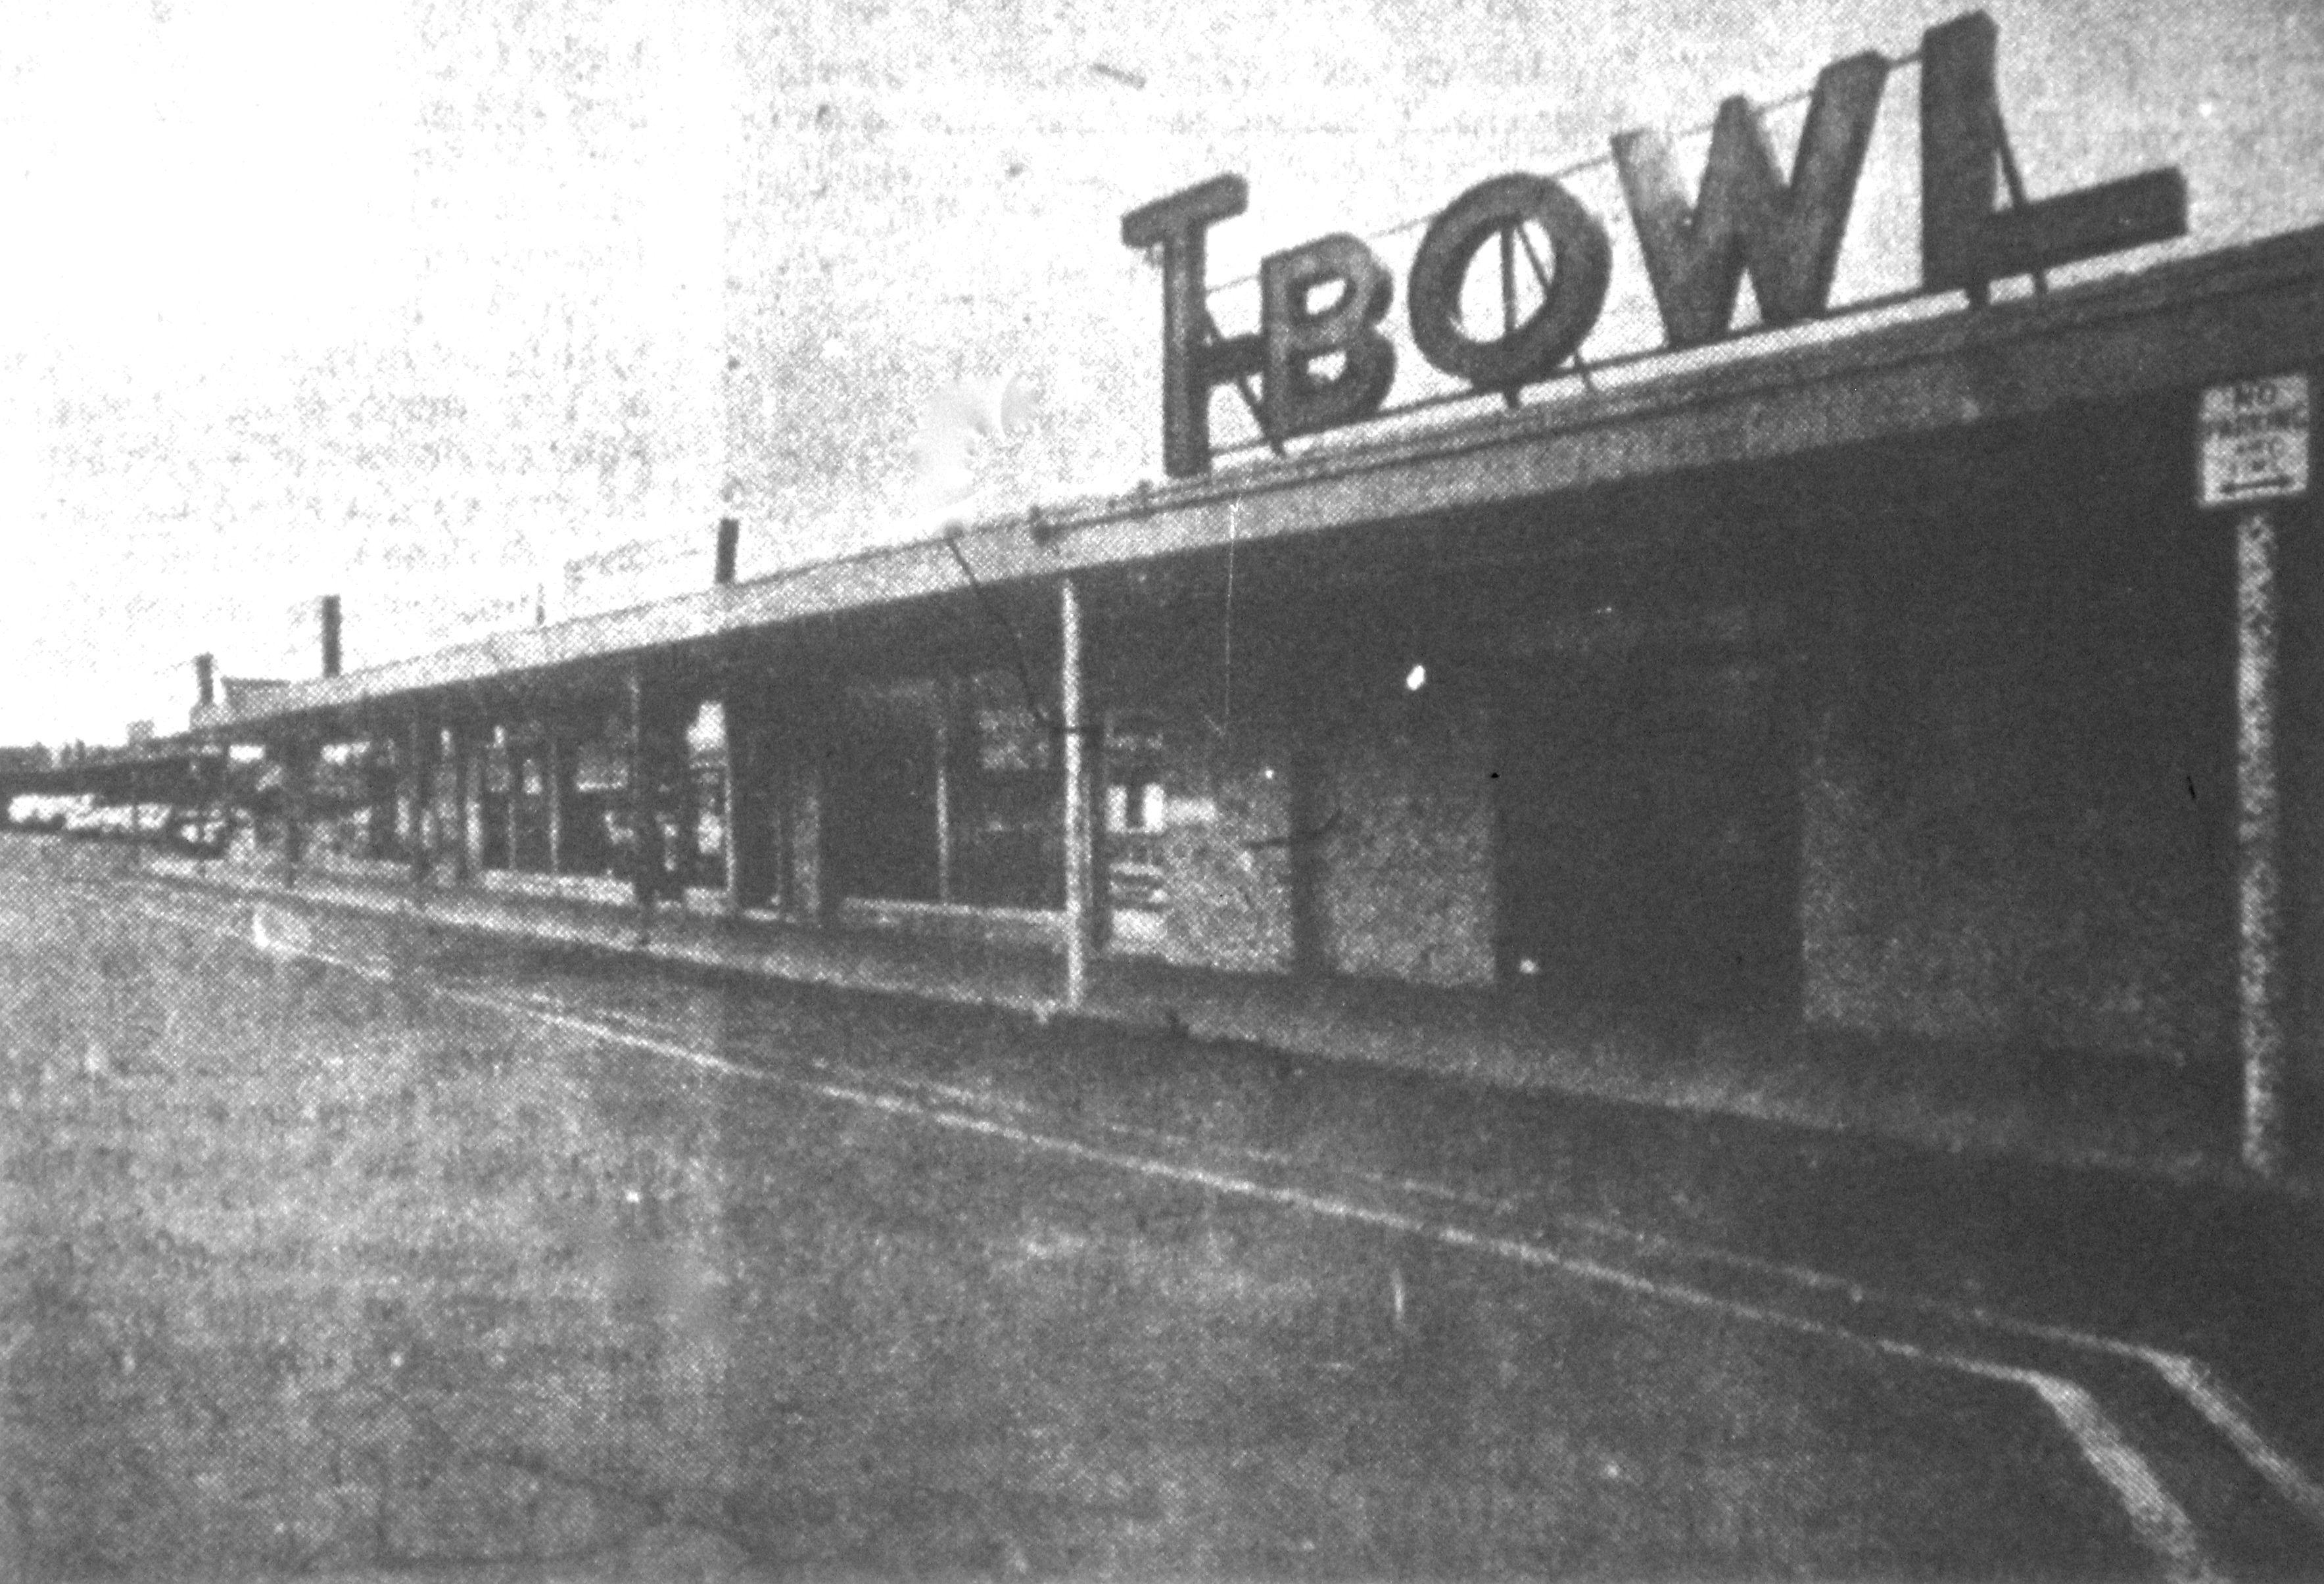 T Bowl Shopping Center In Wayne Nj 1982 Jersey Shore New Jersey Jaunt